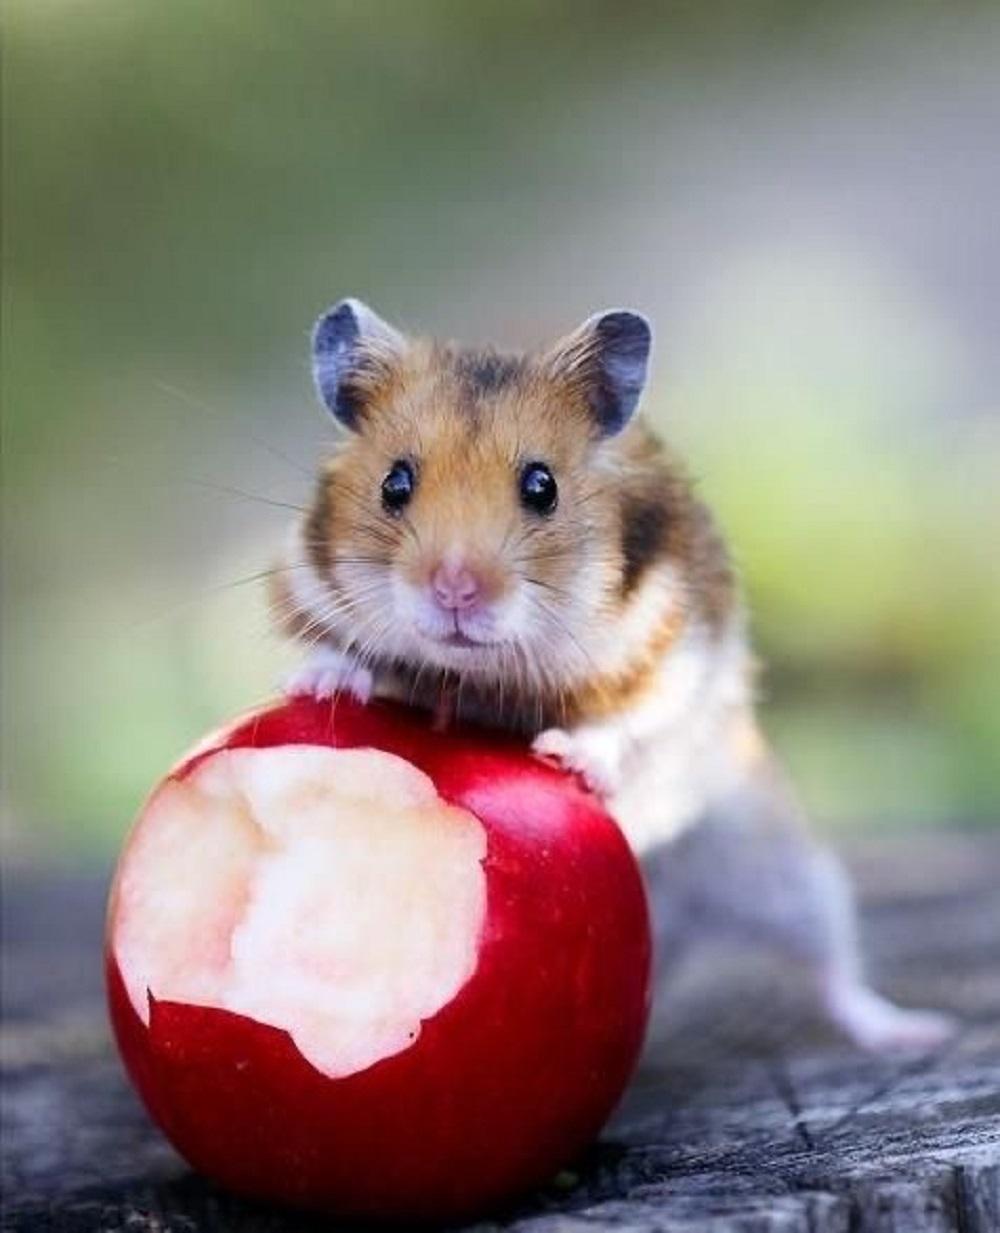 Me han pillado infraganti comiendo mi manzana.